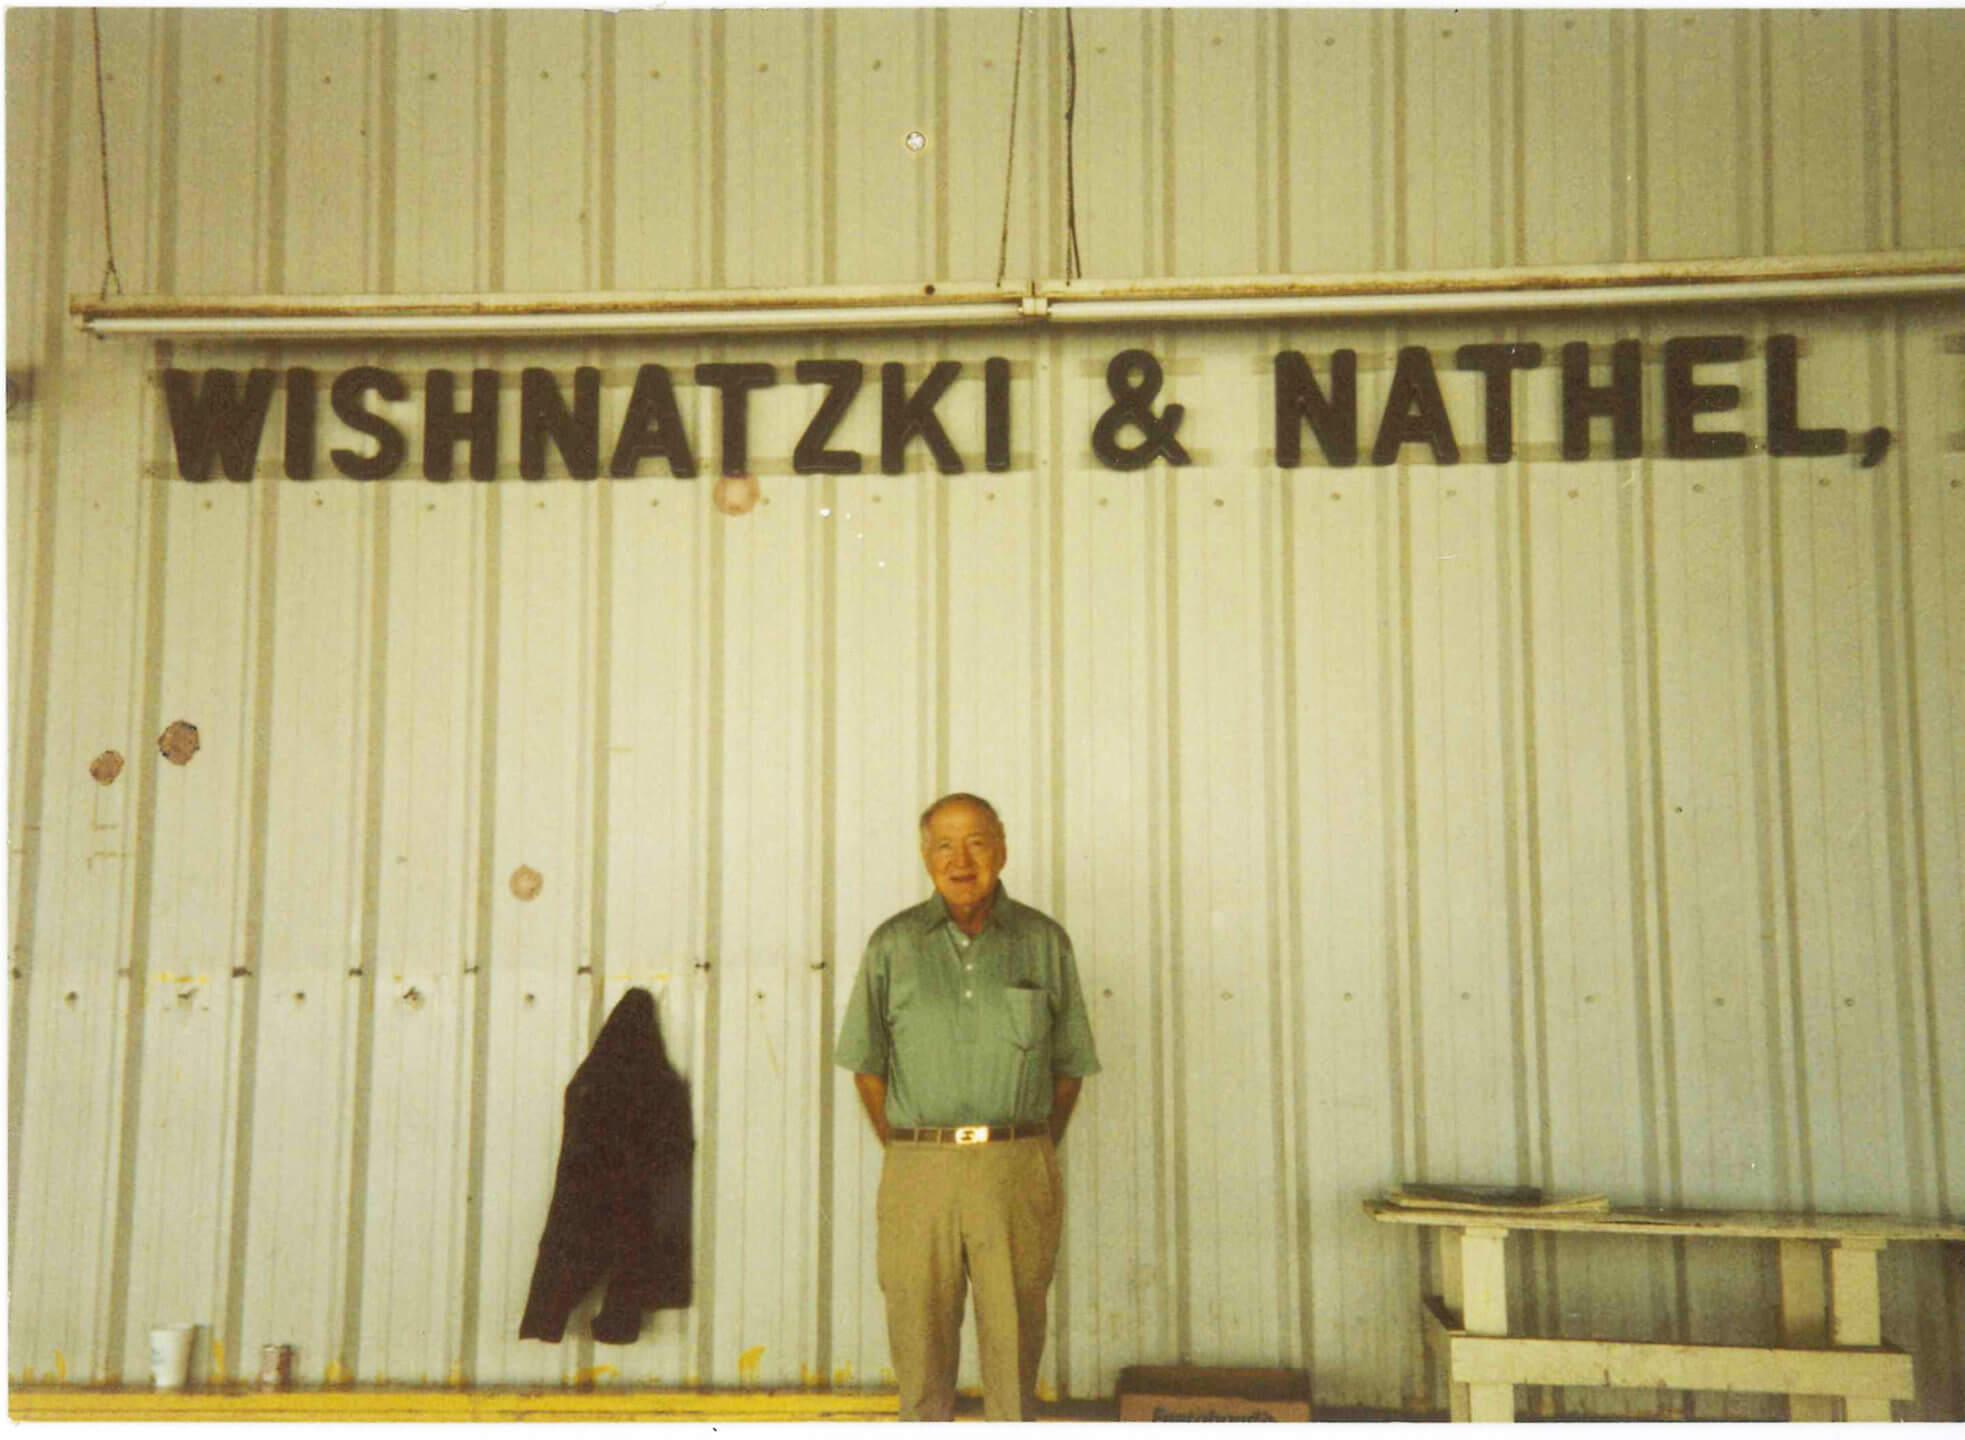 Lester Wishnatzki on the Wish Farms main office loading dock in Plant City, FL